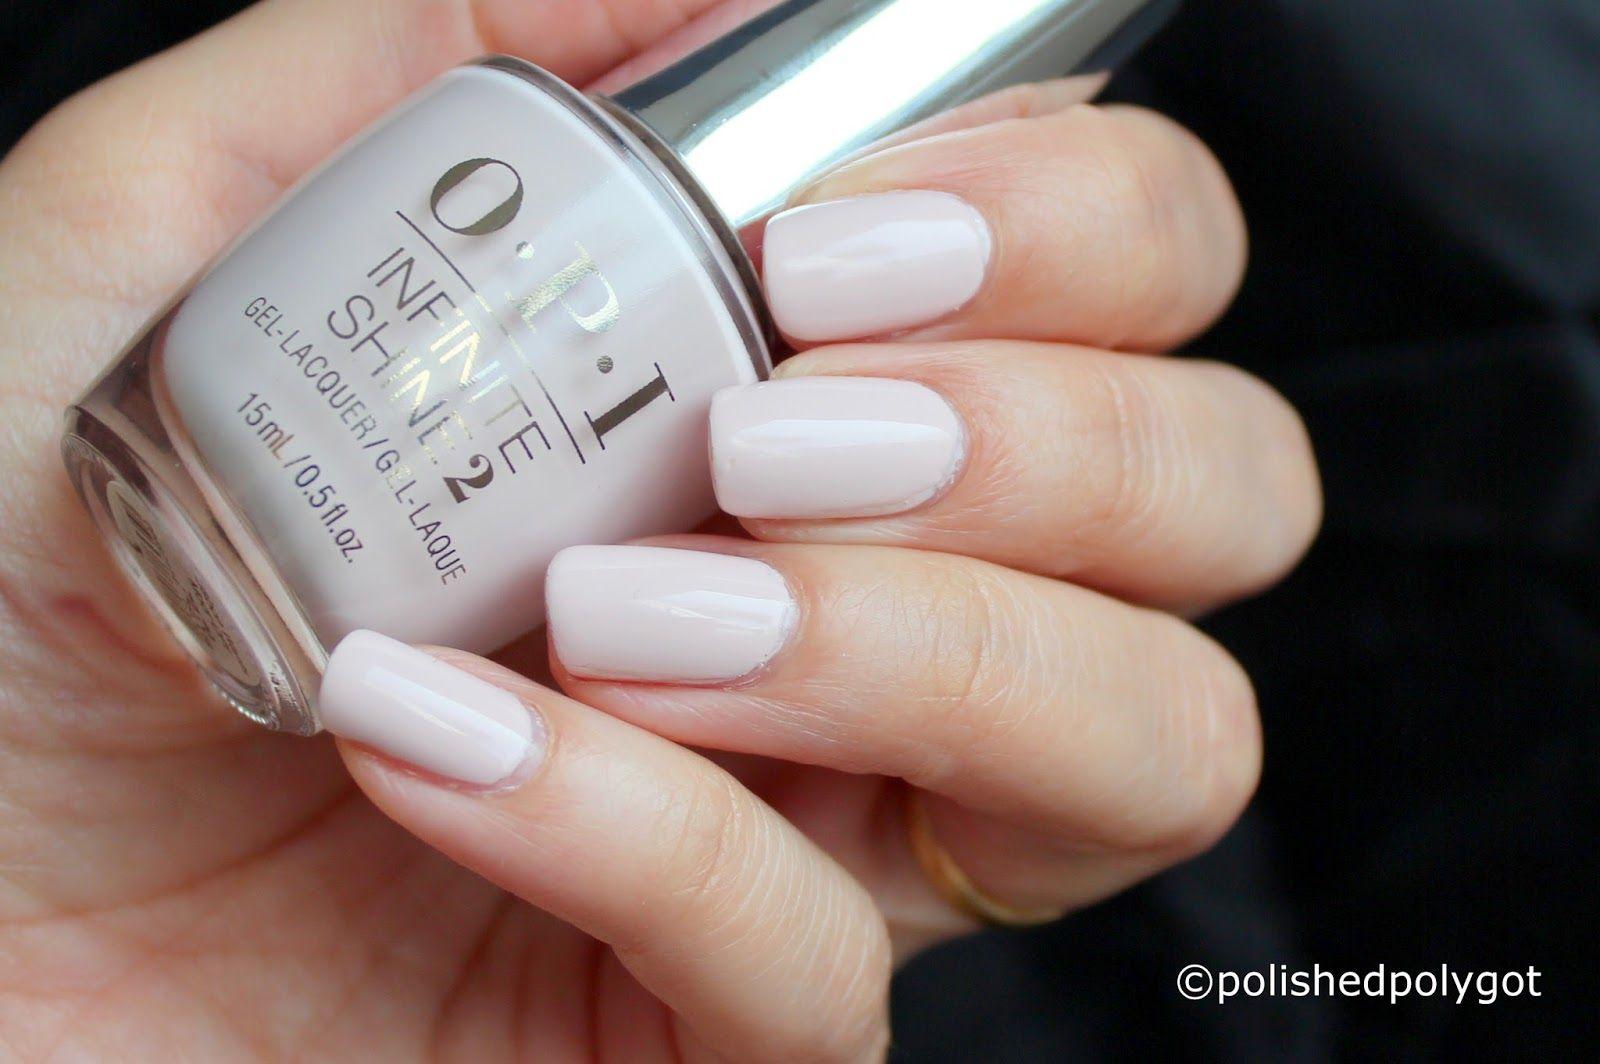 Nail polish opi lisbon collection for springsummer